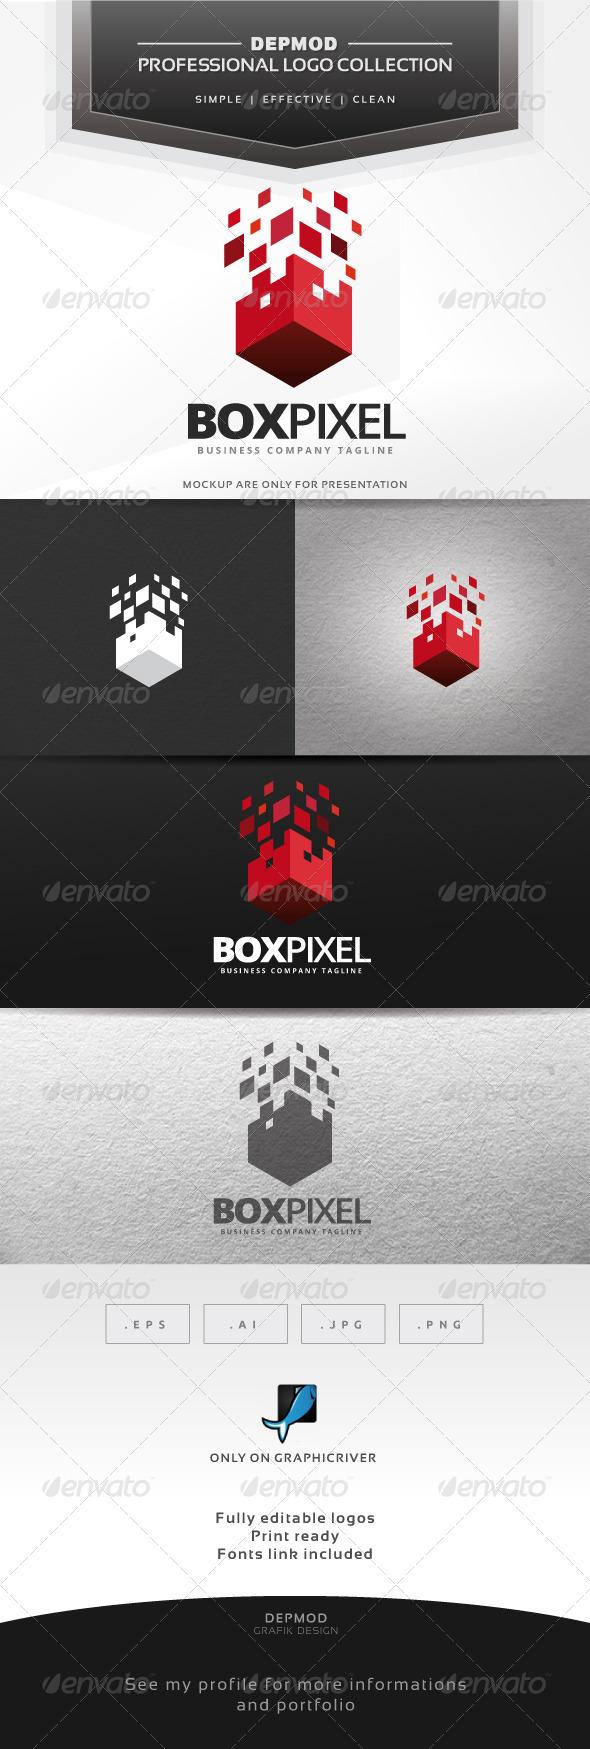 Box Pixel Logo - Abstract Logo Templates